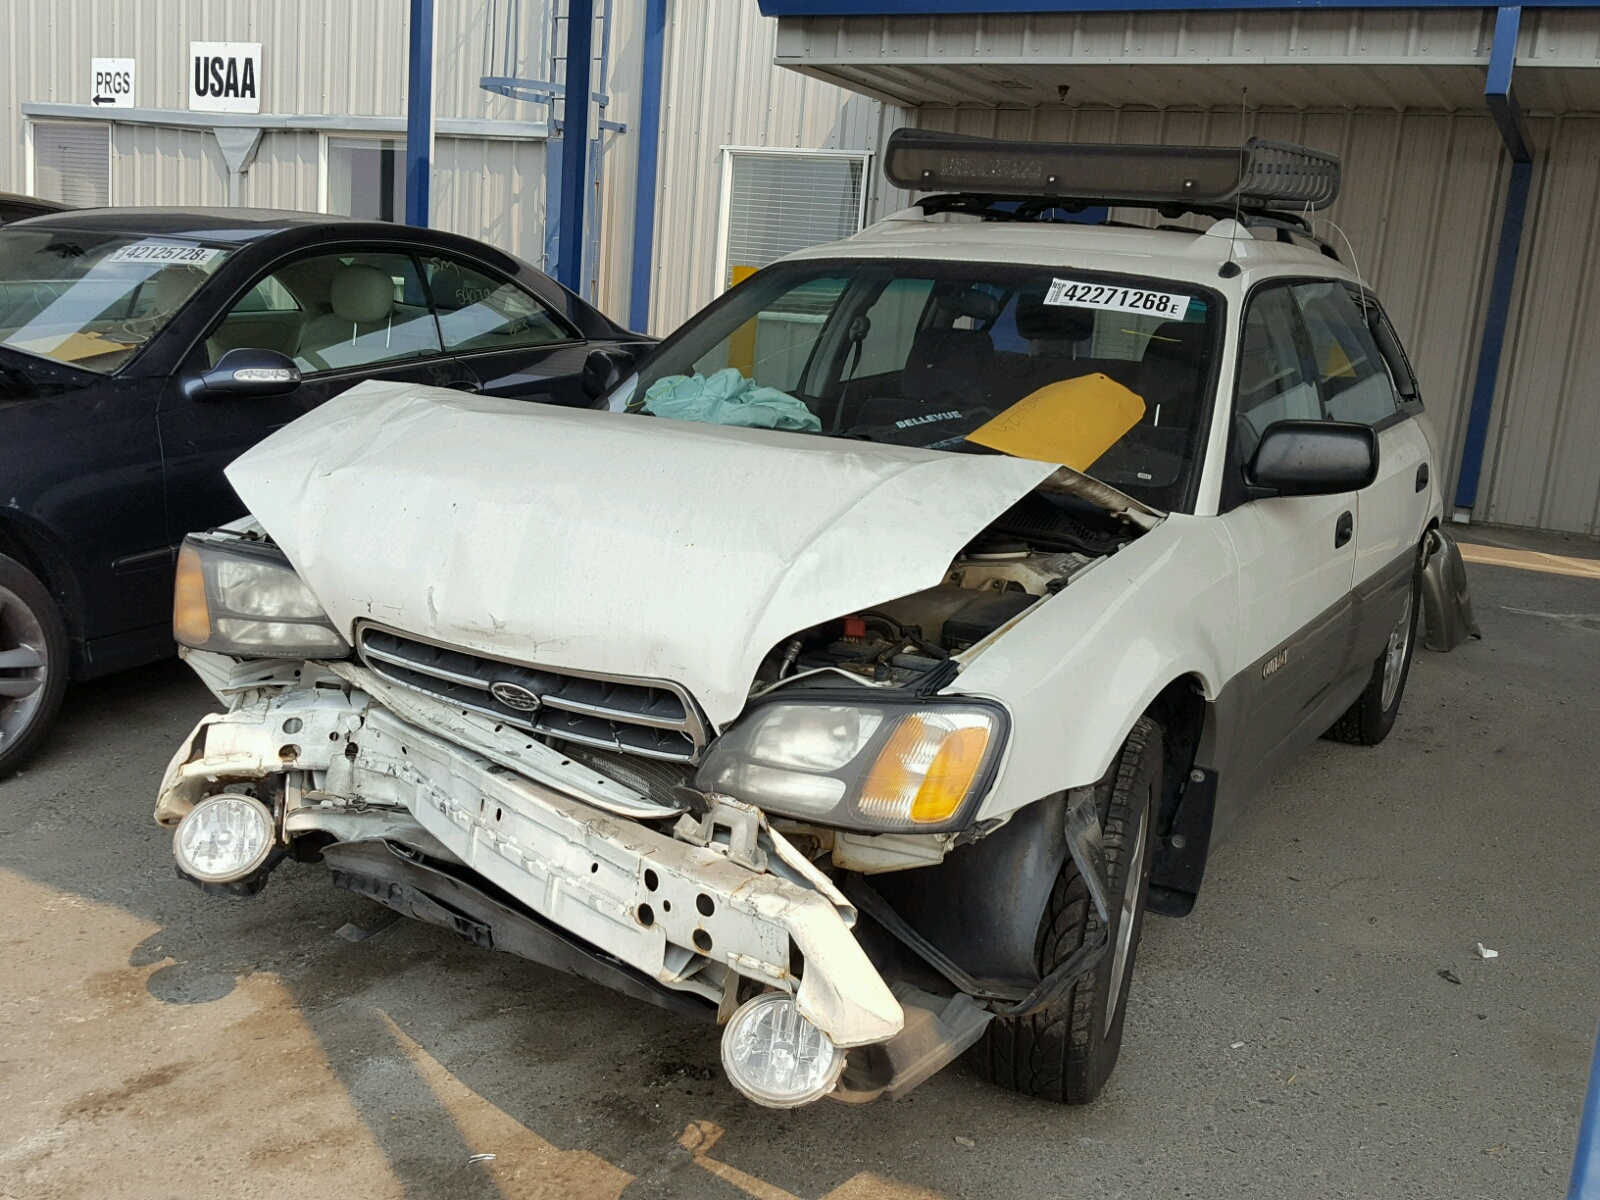 2000 Subaru Legacy Outback For Sale At Copart Sacramento Ca Lot 42271268